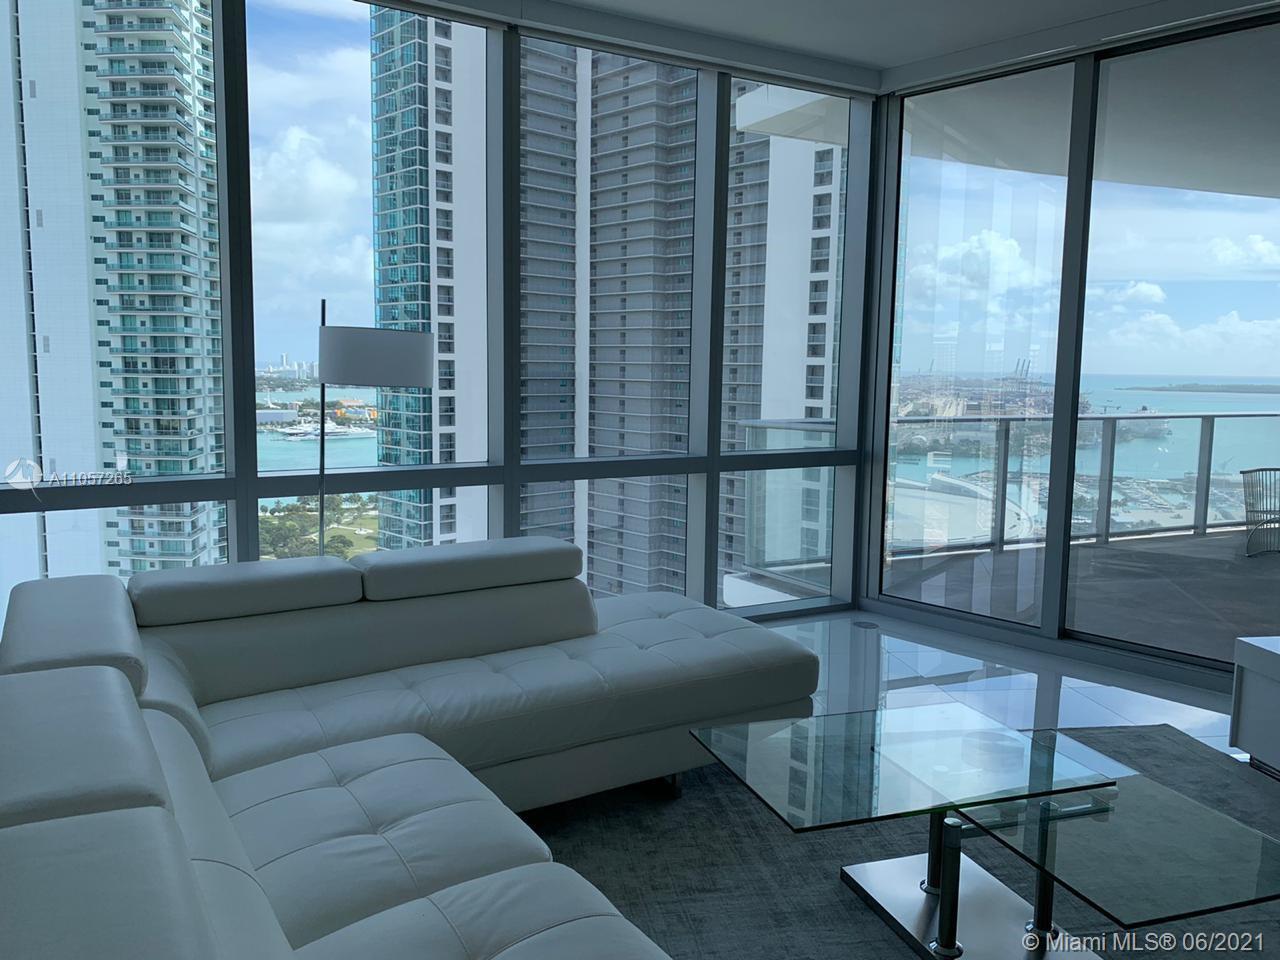 Paramount Miami Worldcenter #2703 - 851 NE 1st Ave #2703, Miami, FL 33132